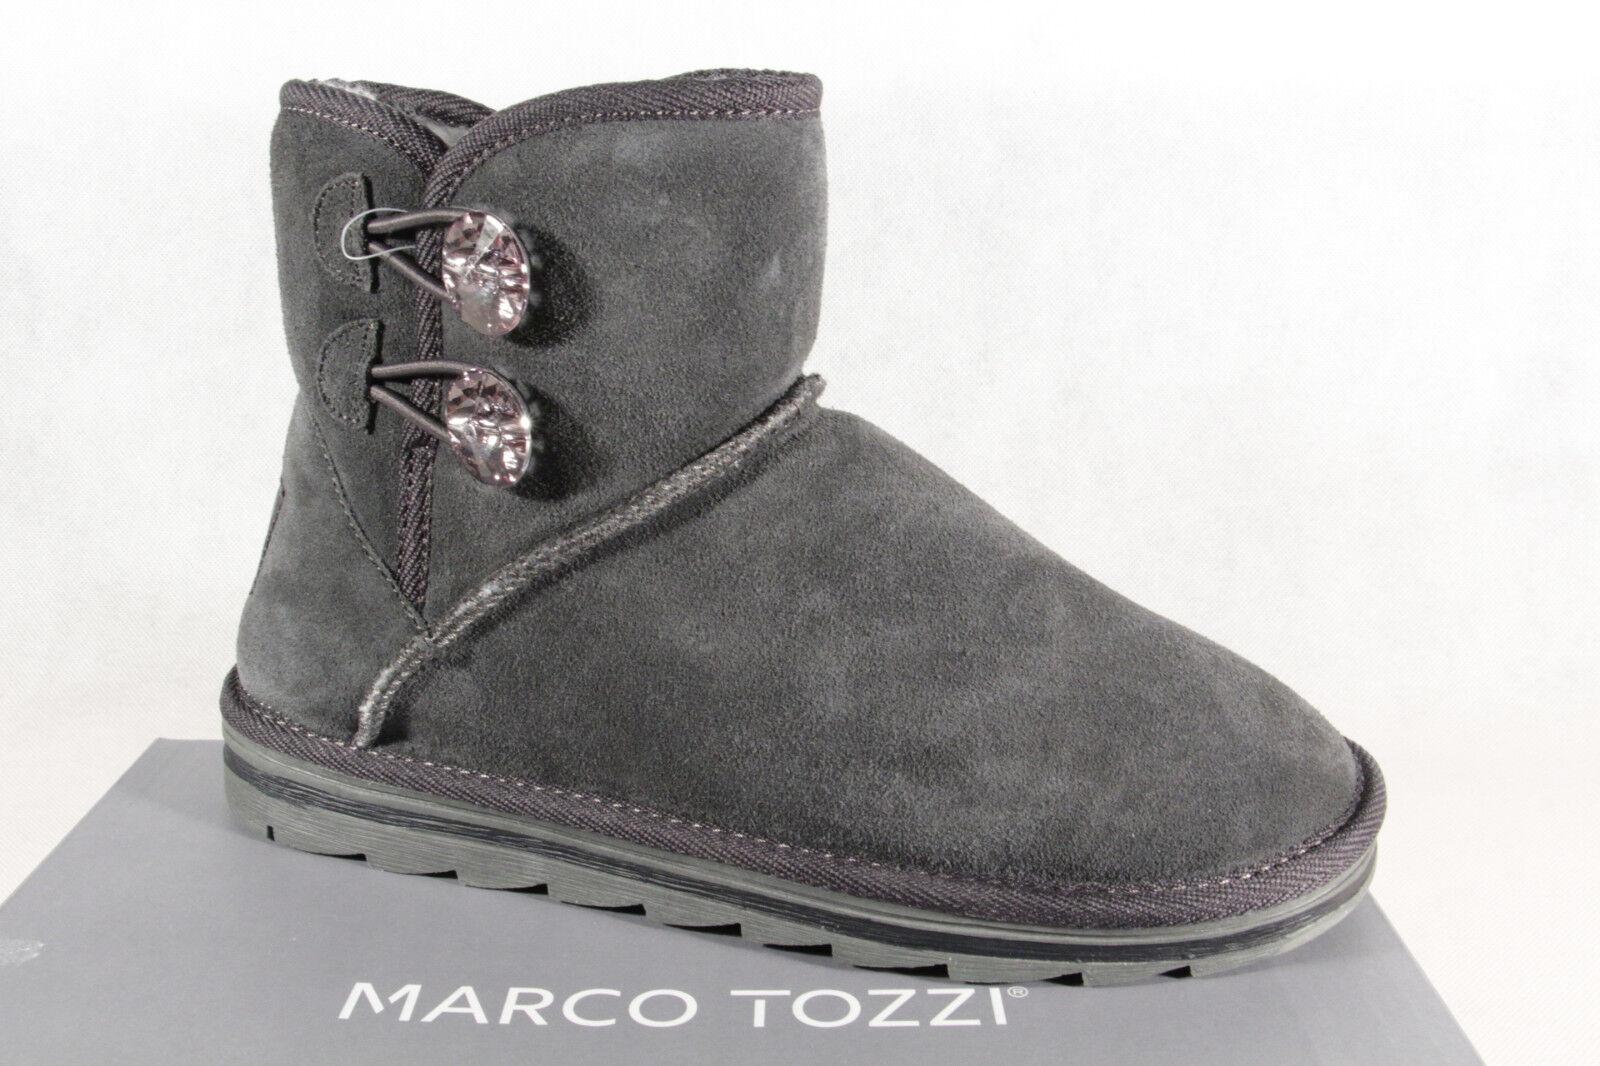 Marco Winterstiefel Tozzi Stiefel Stiefelette Boots Winterstiefel Marco grau 26822 NEU 0959a0